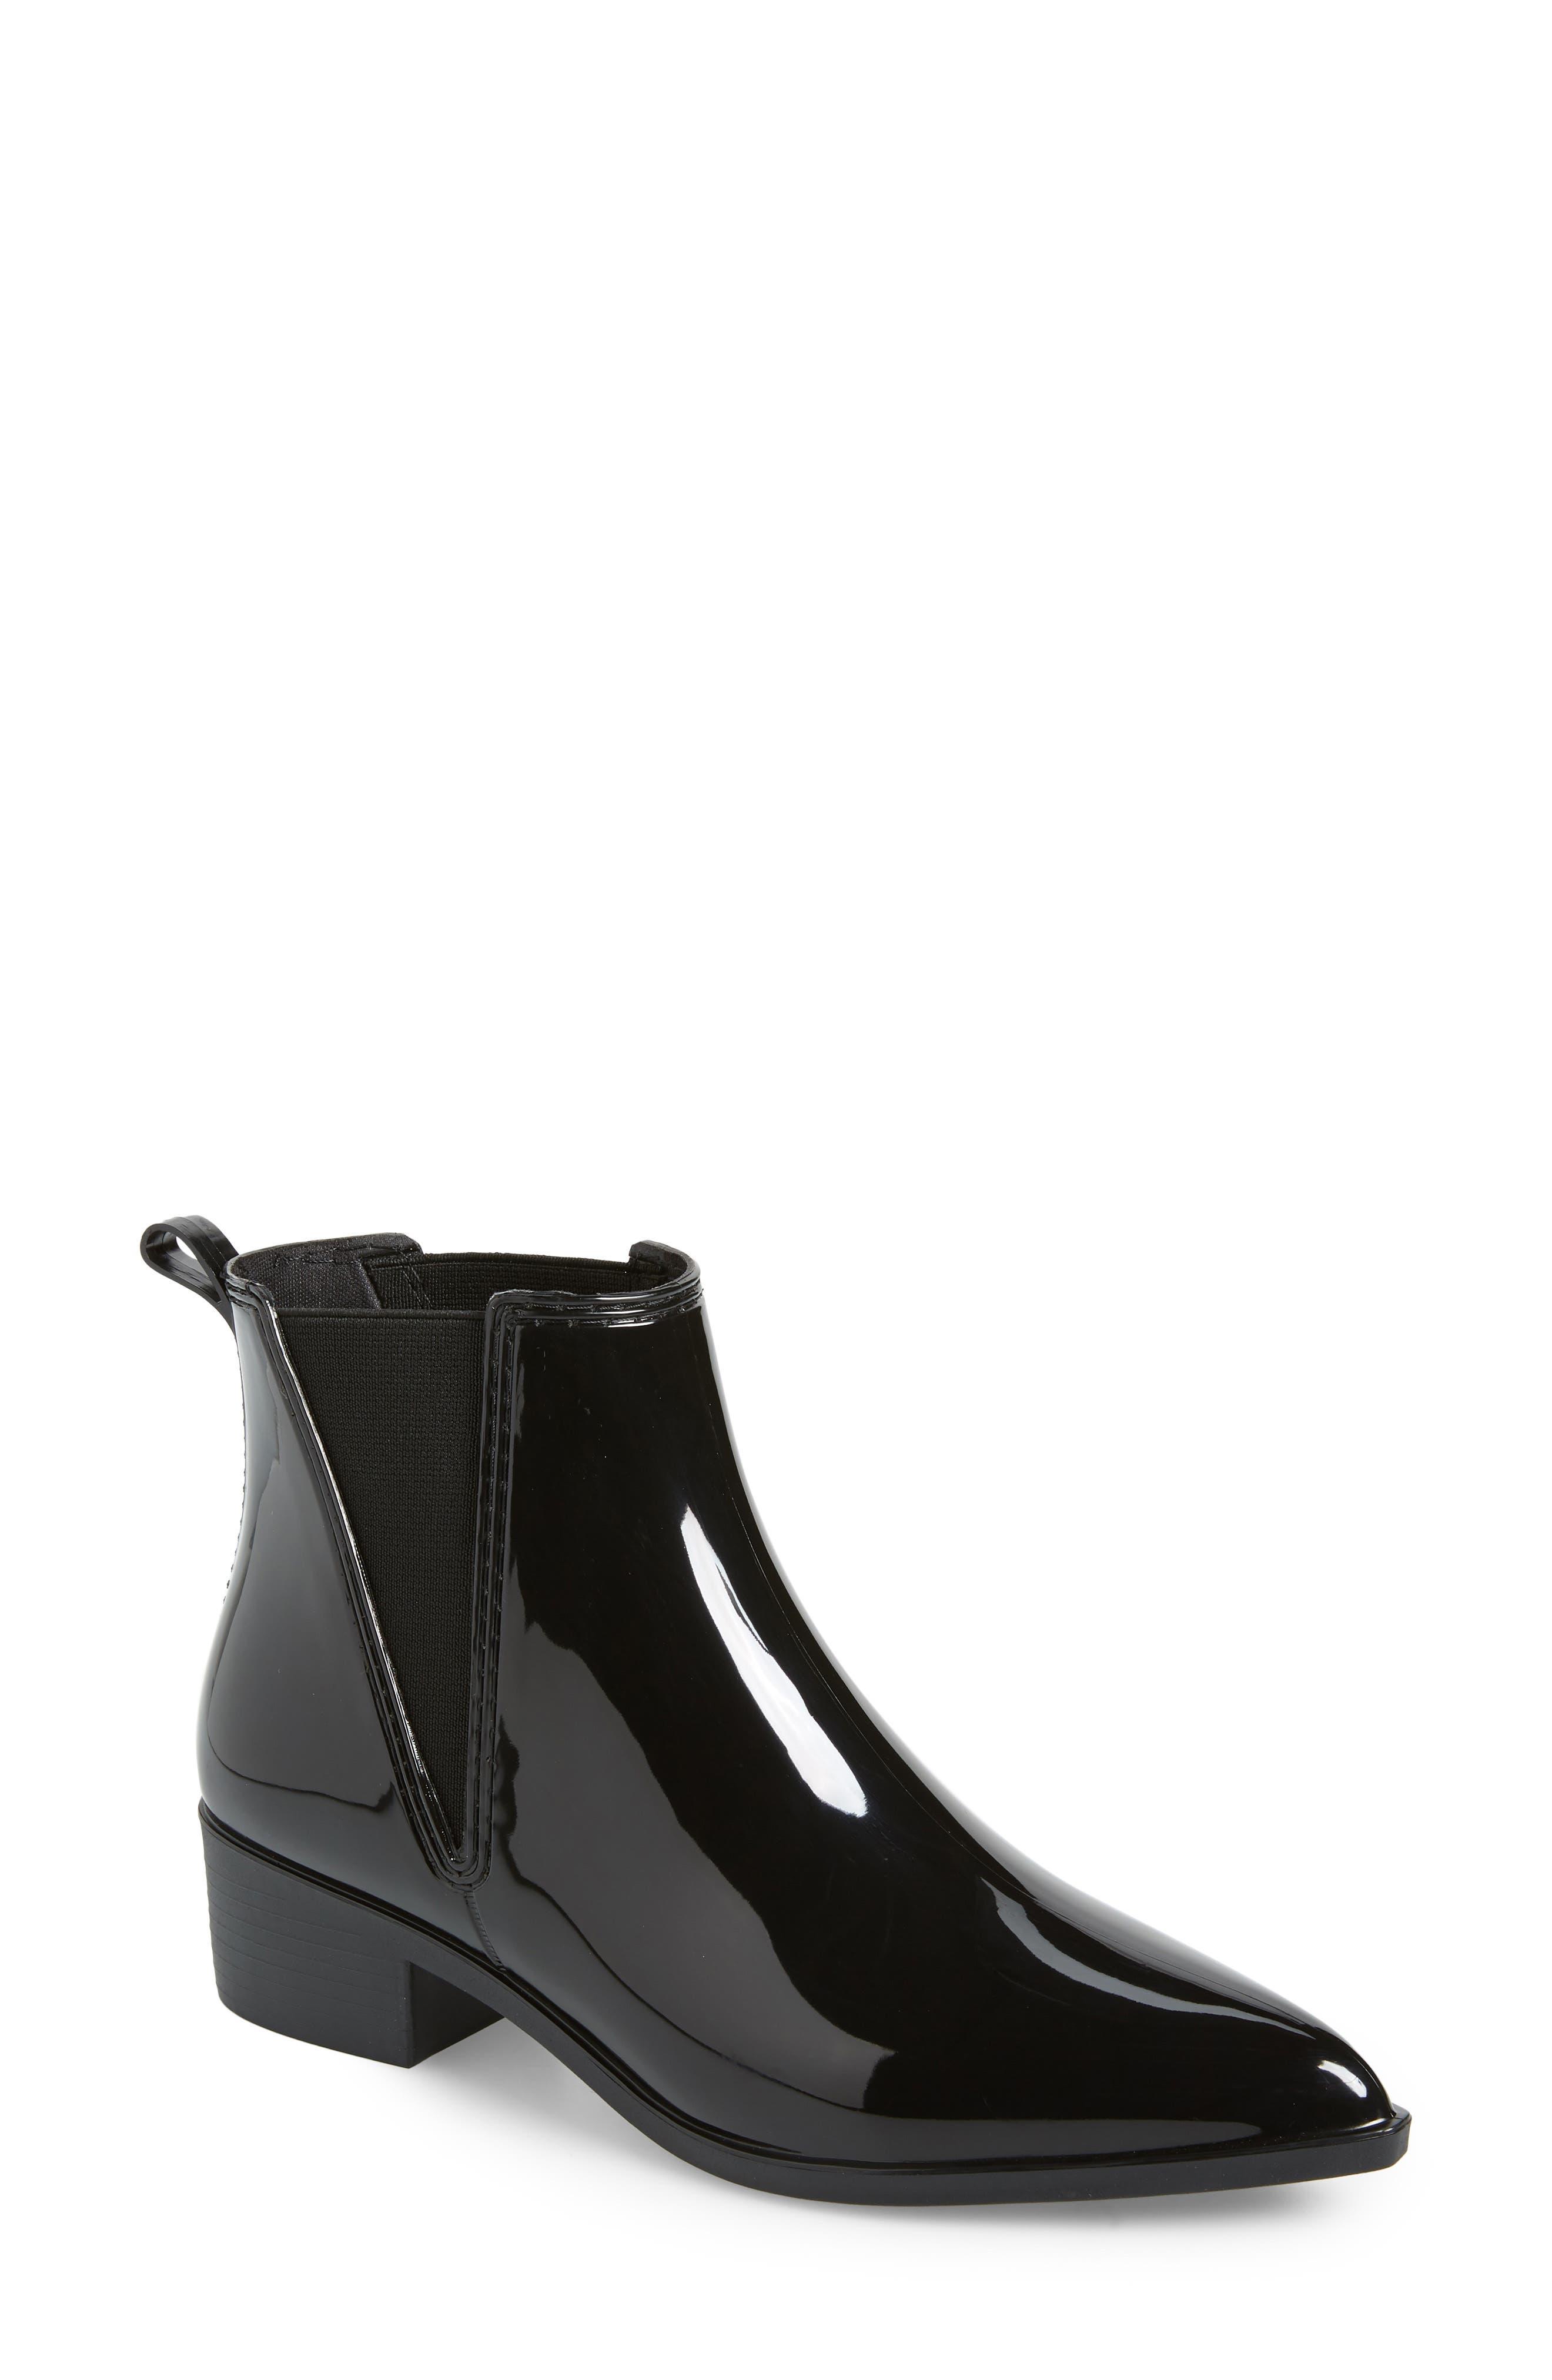 JEFFREY CAMPBELL Mist Chelsea Waterproof Rain Boot, Main, color, 002